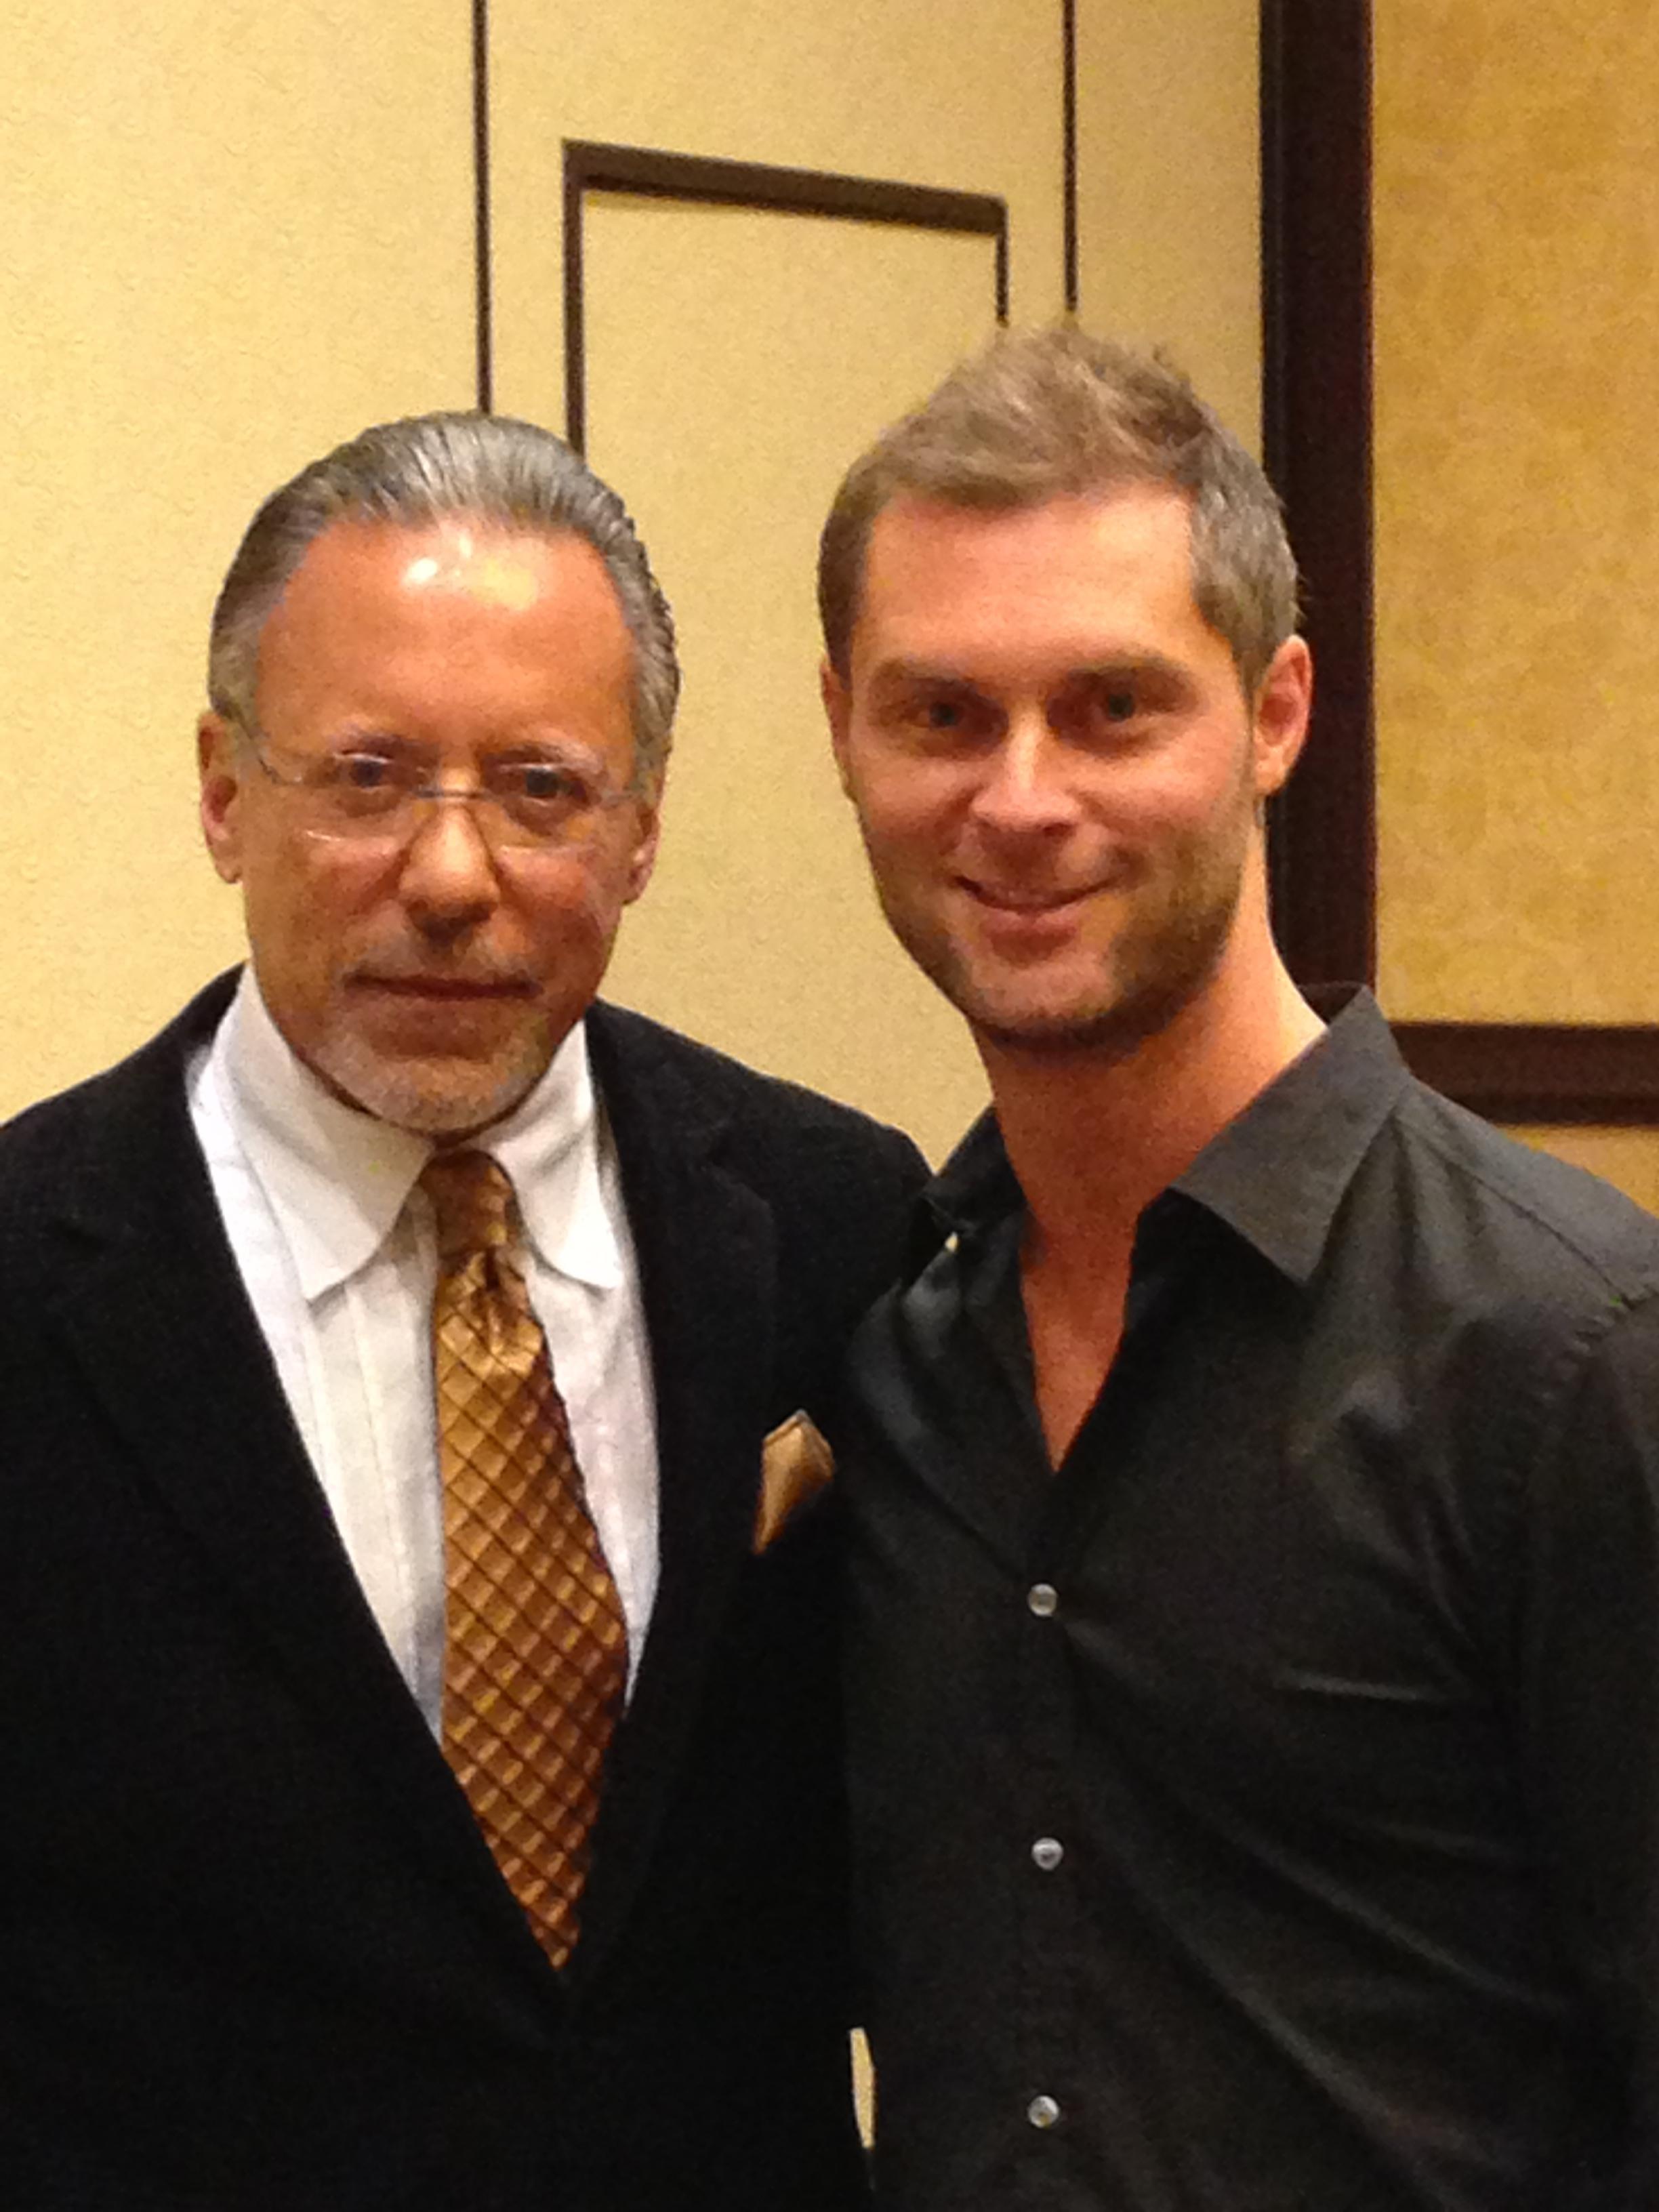 """BEST Miami Business Coaching"" "" TOP Miami Life Coach"", Ian Houghton, JFDI GLOBAL, Internatinoal Speaker"